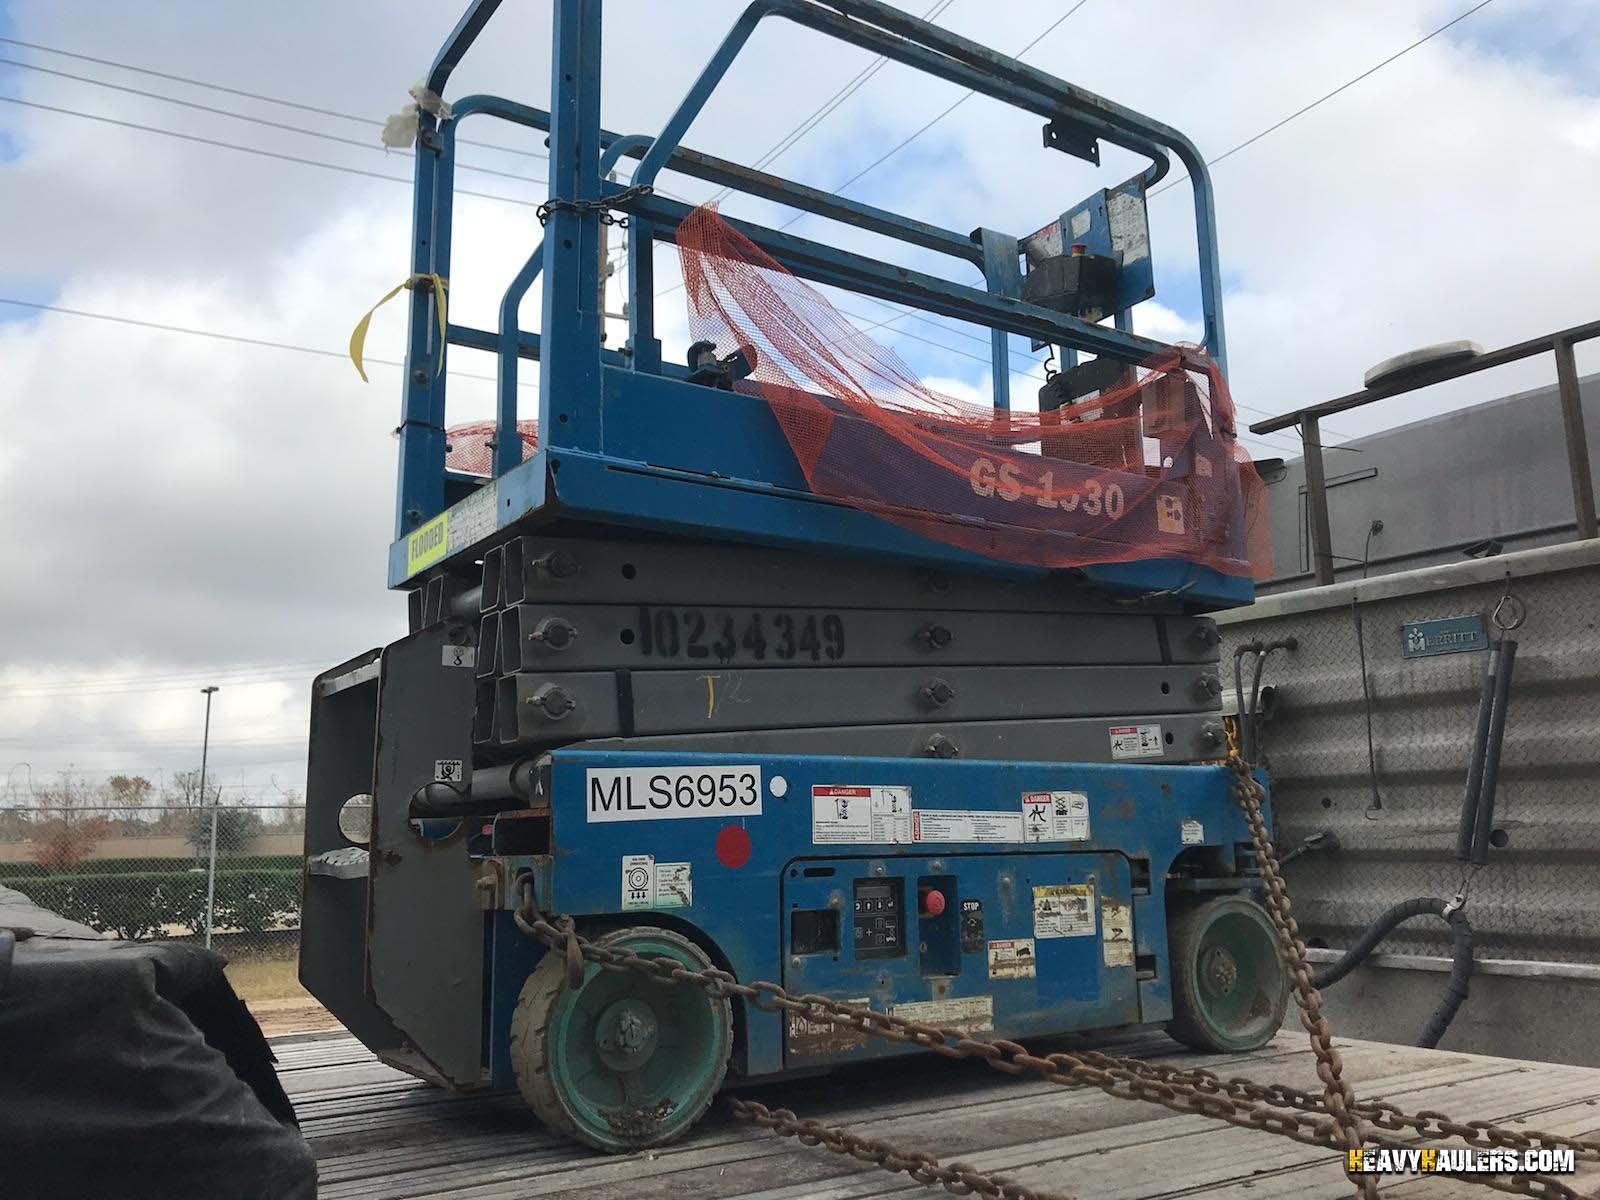 Scissor Lift Shipping | Heavy Haulers | (800) 908-6206